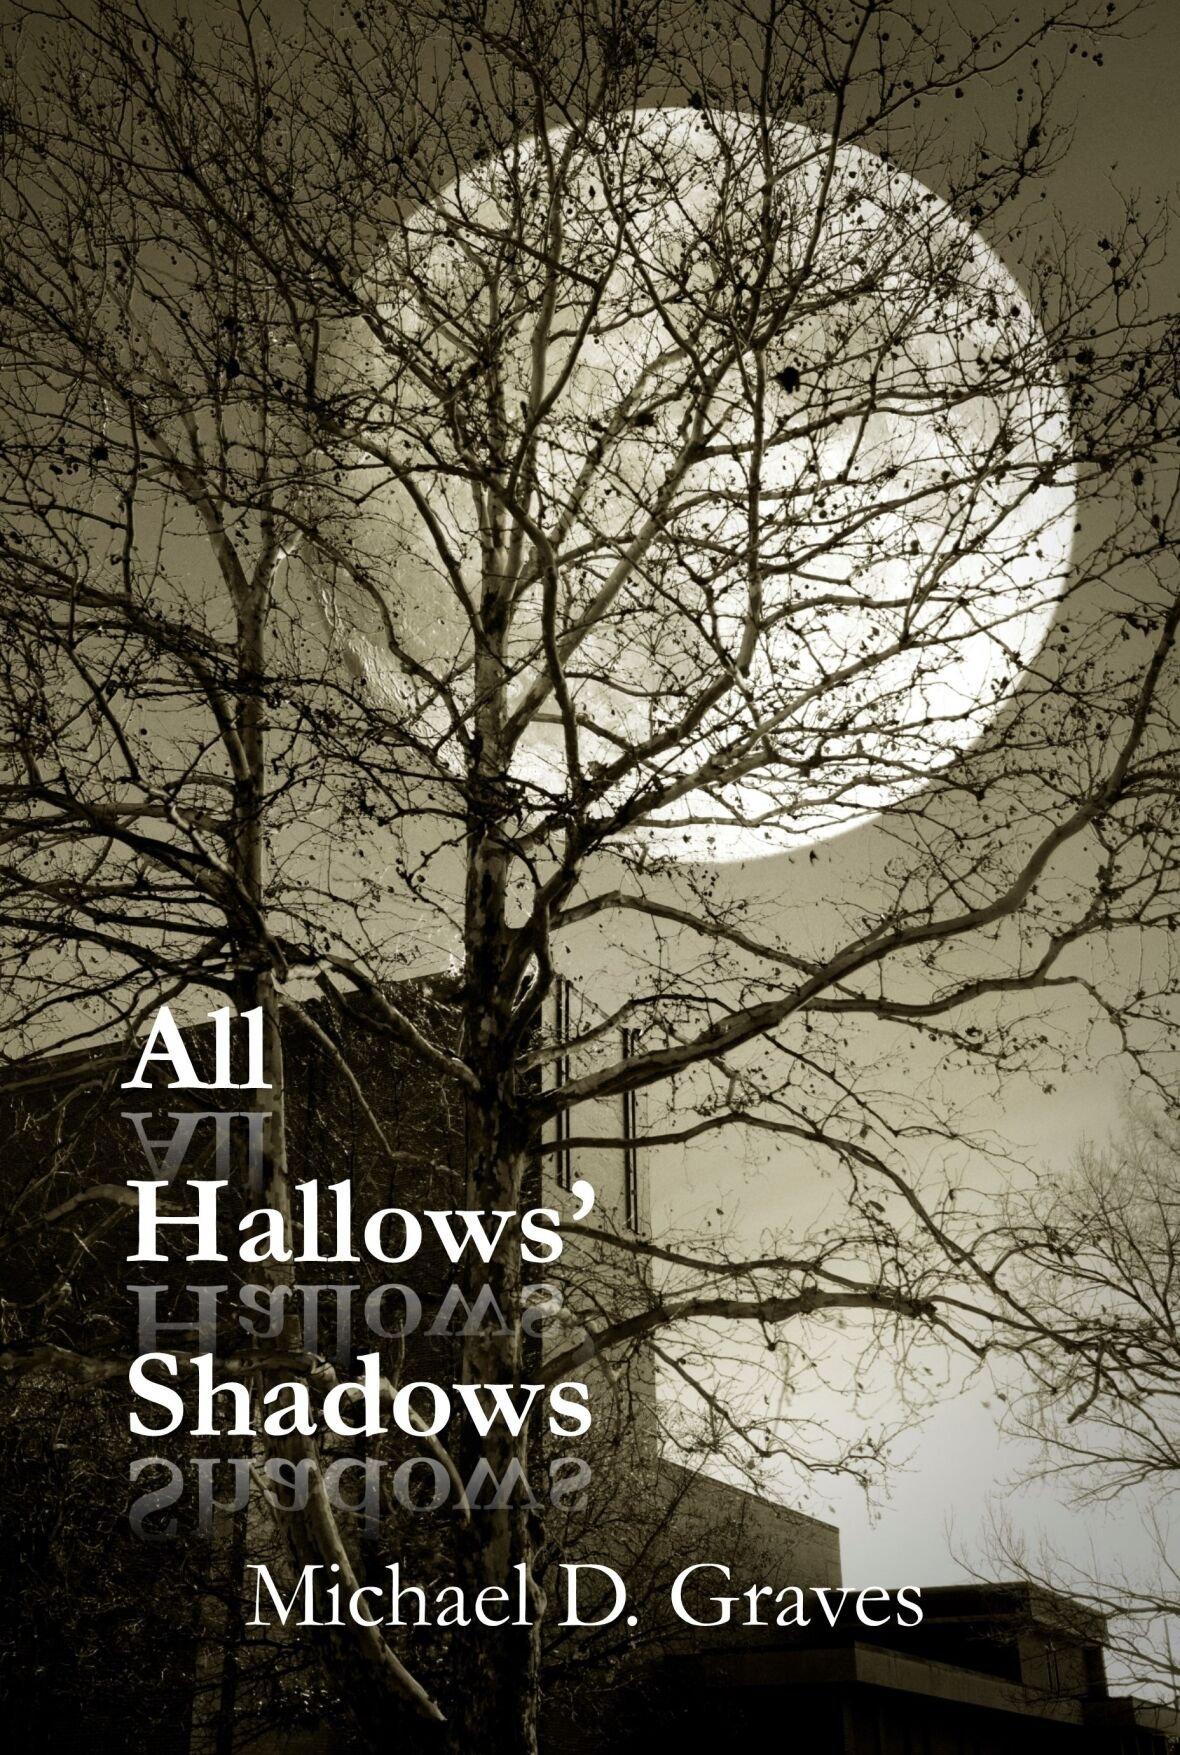 All Hallows Cover (2).jpg